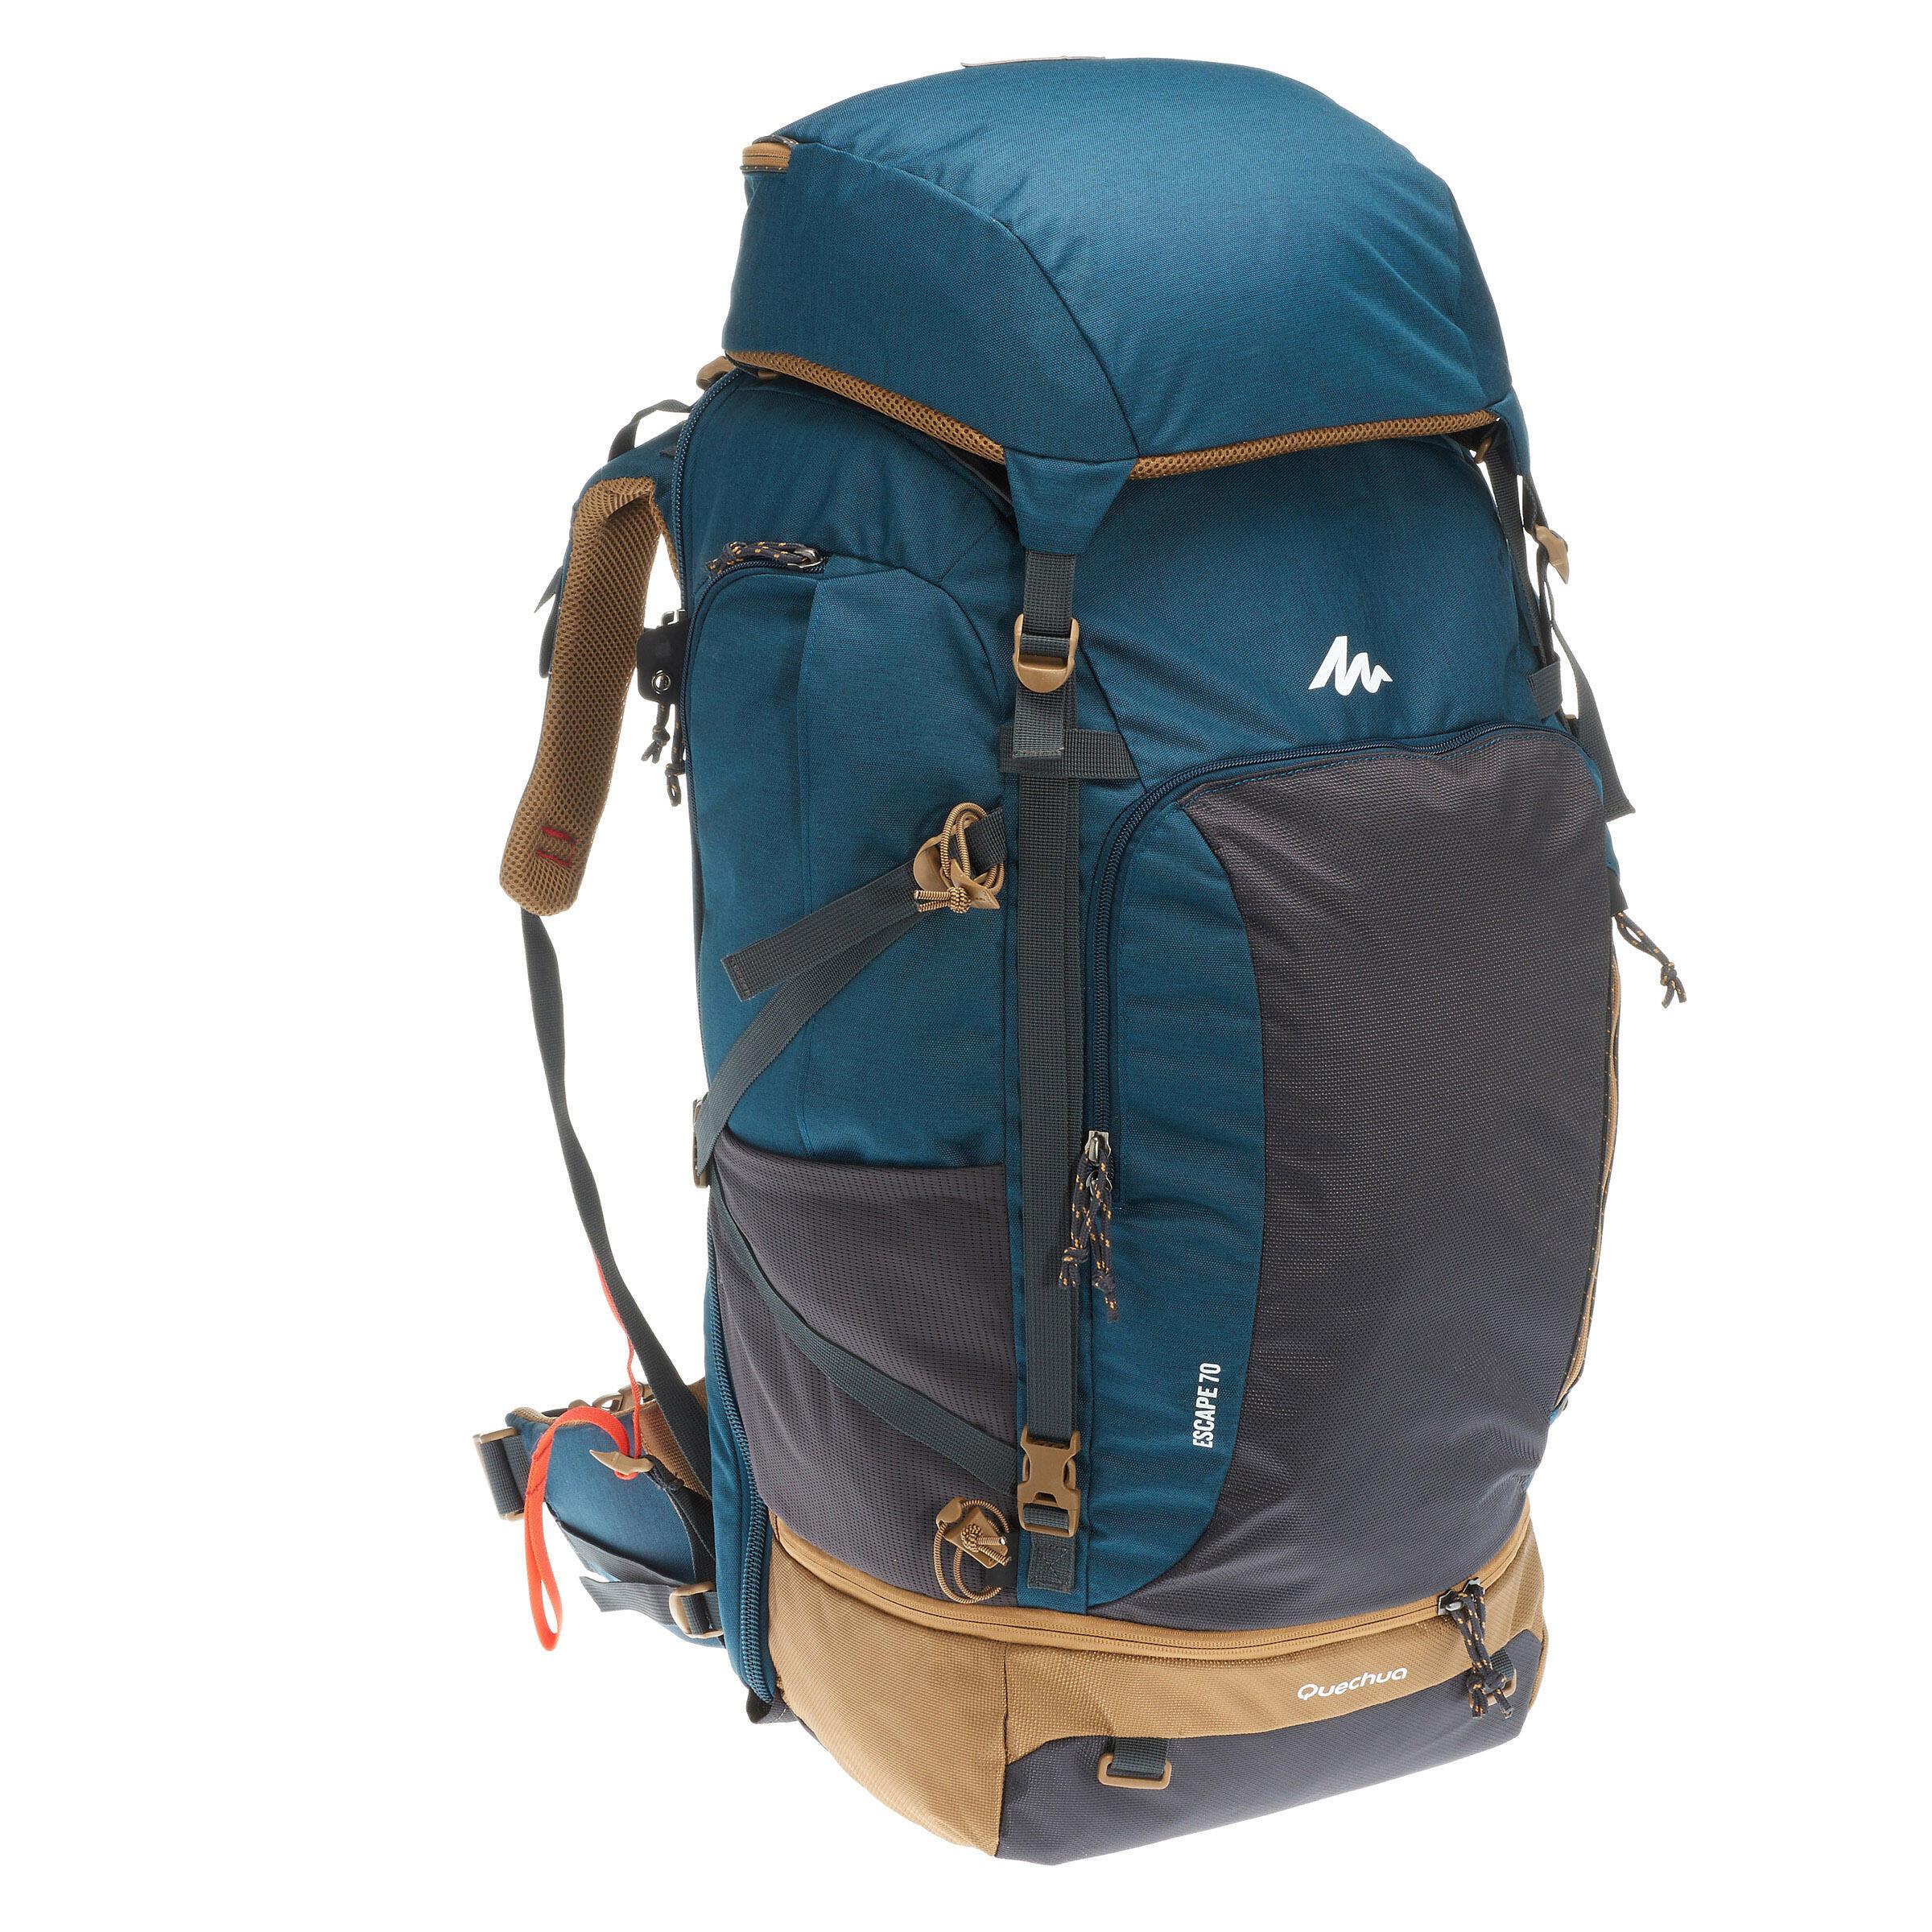 Para Azul Travel Trekking Apta Candado Mochila Litros 70 Hombre 500 0zWq6wp f7d288b87f53